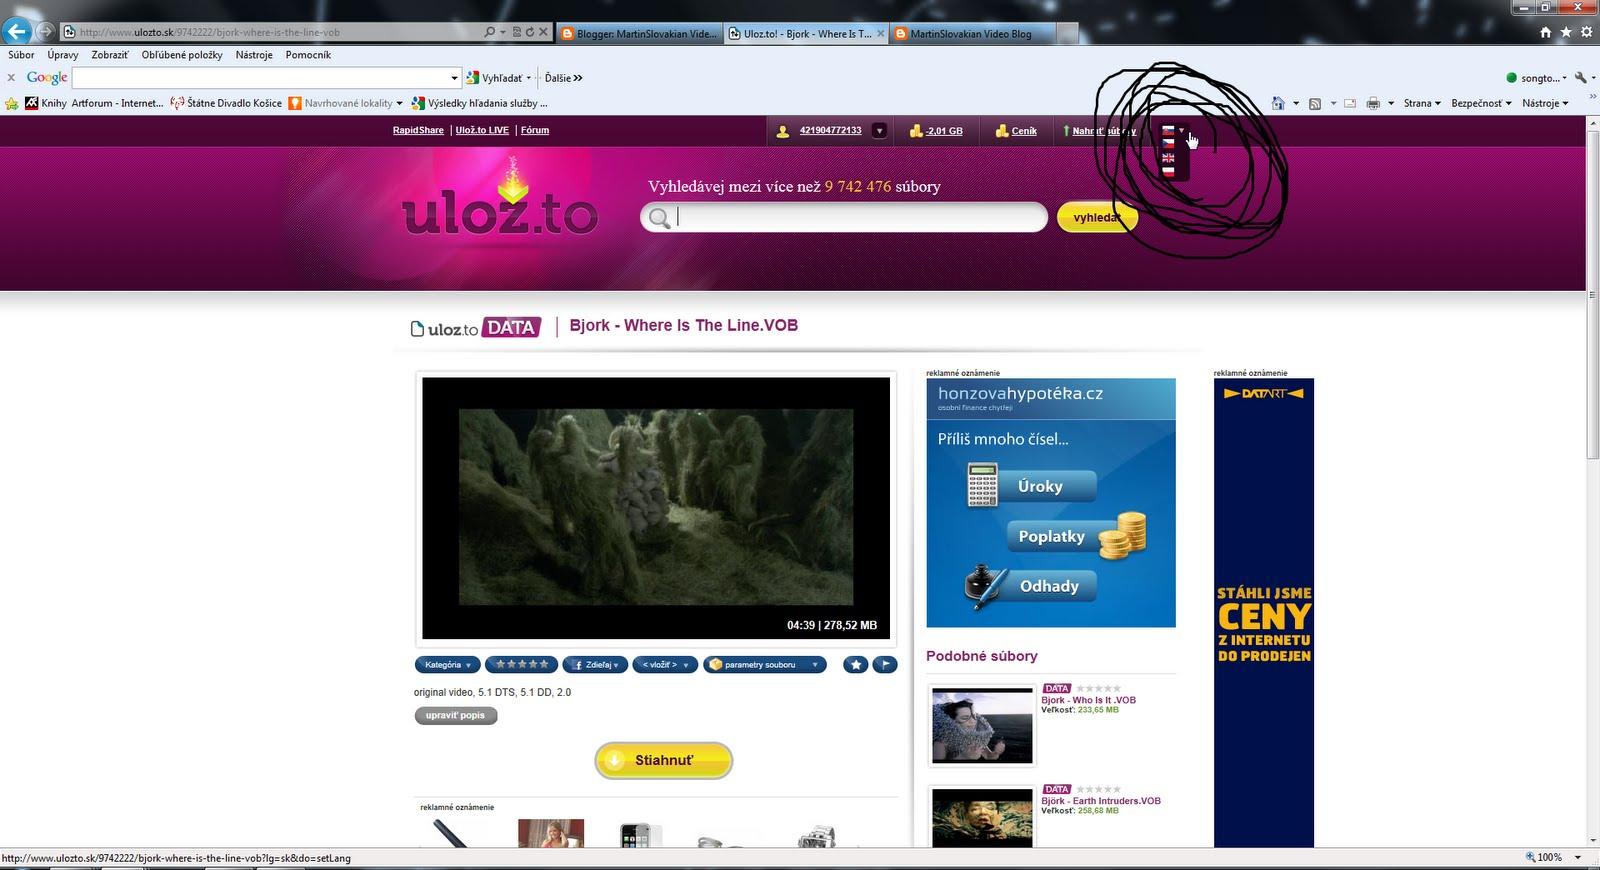 http://1.bp.blogspot.com/-BfcM_l-UtF4/Tif3kaai-pI/AAAAAAAAABs/FINH0OMj9iA/s1600/ScreenShot+Mark065.bmp